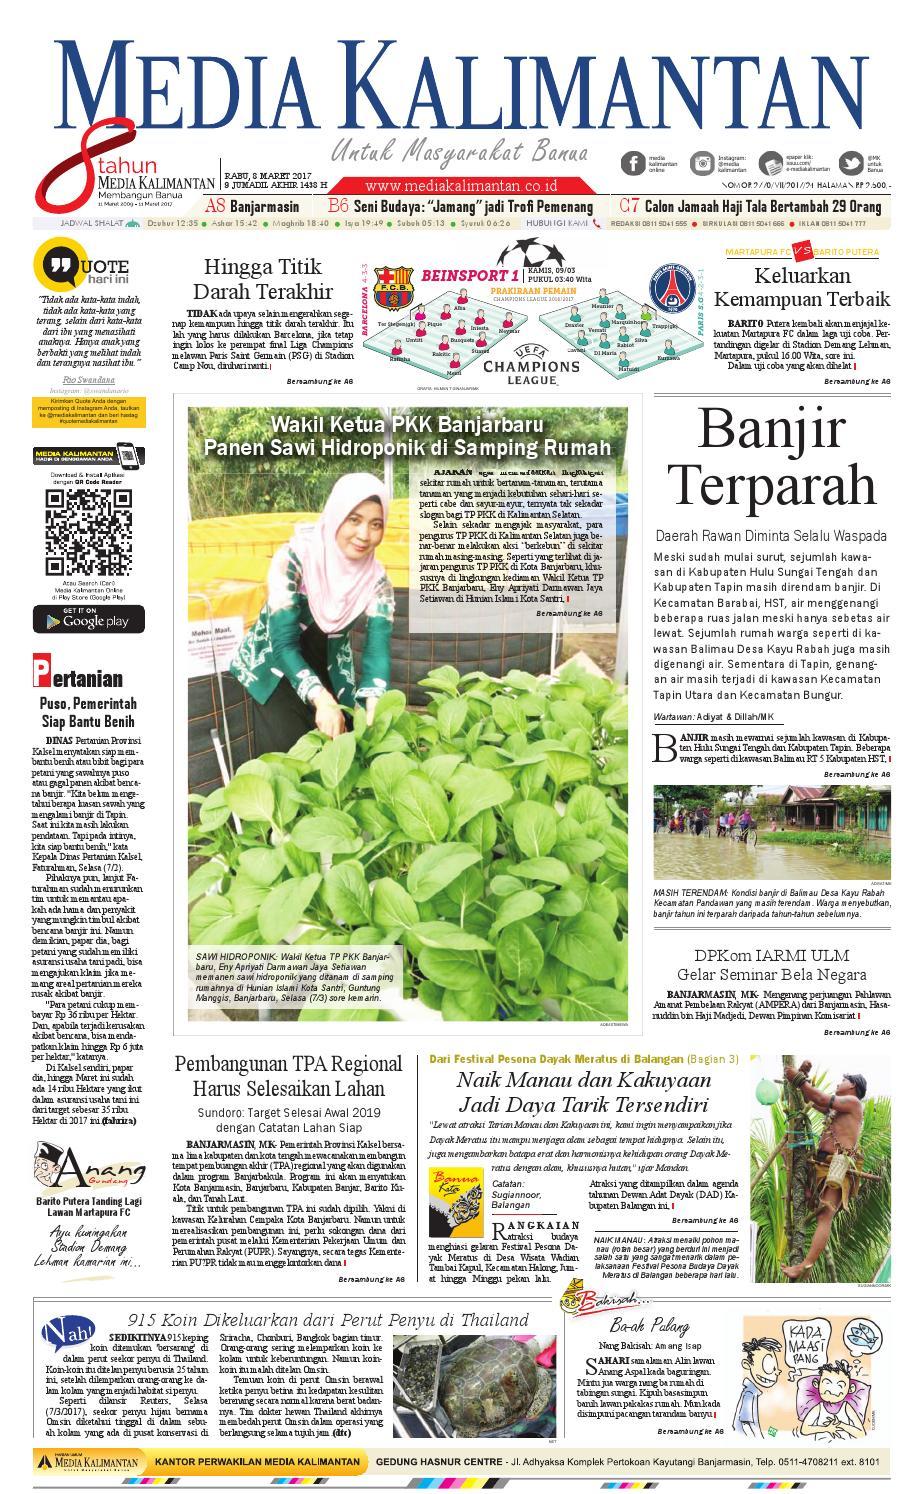 MEDIA KALIMANTAN RABU 8 MARET 2017 By Media Kalimantan Issuu